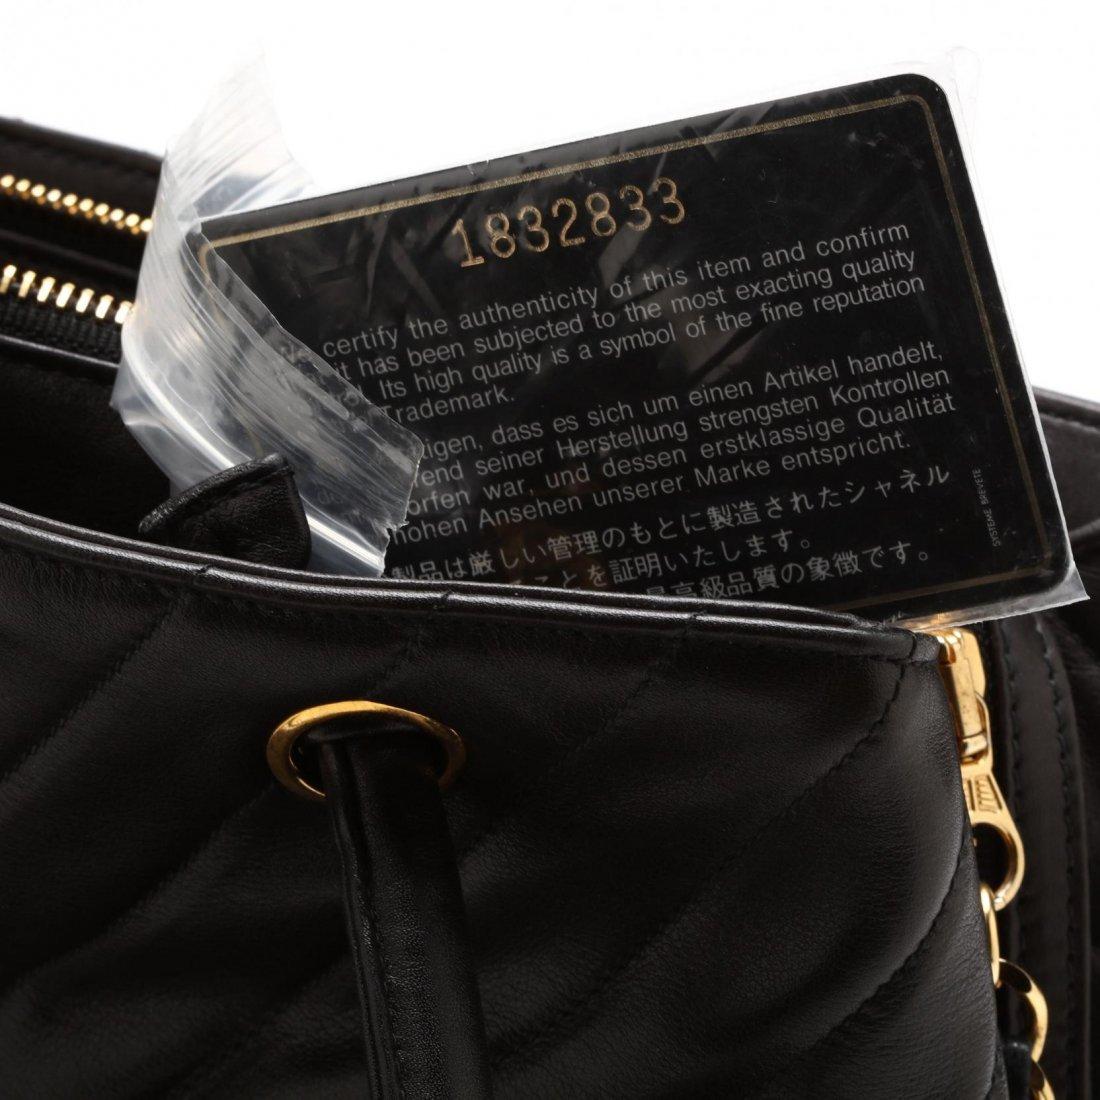 Vintage Lambskin Chevron Handbag, Chanel - 5